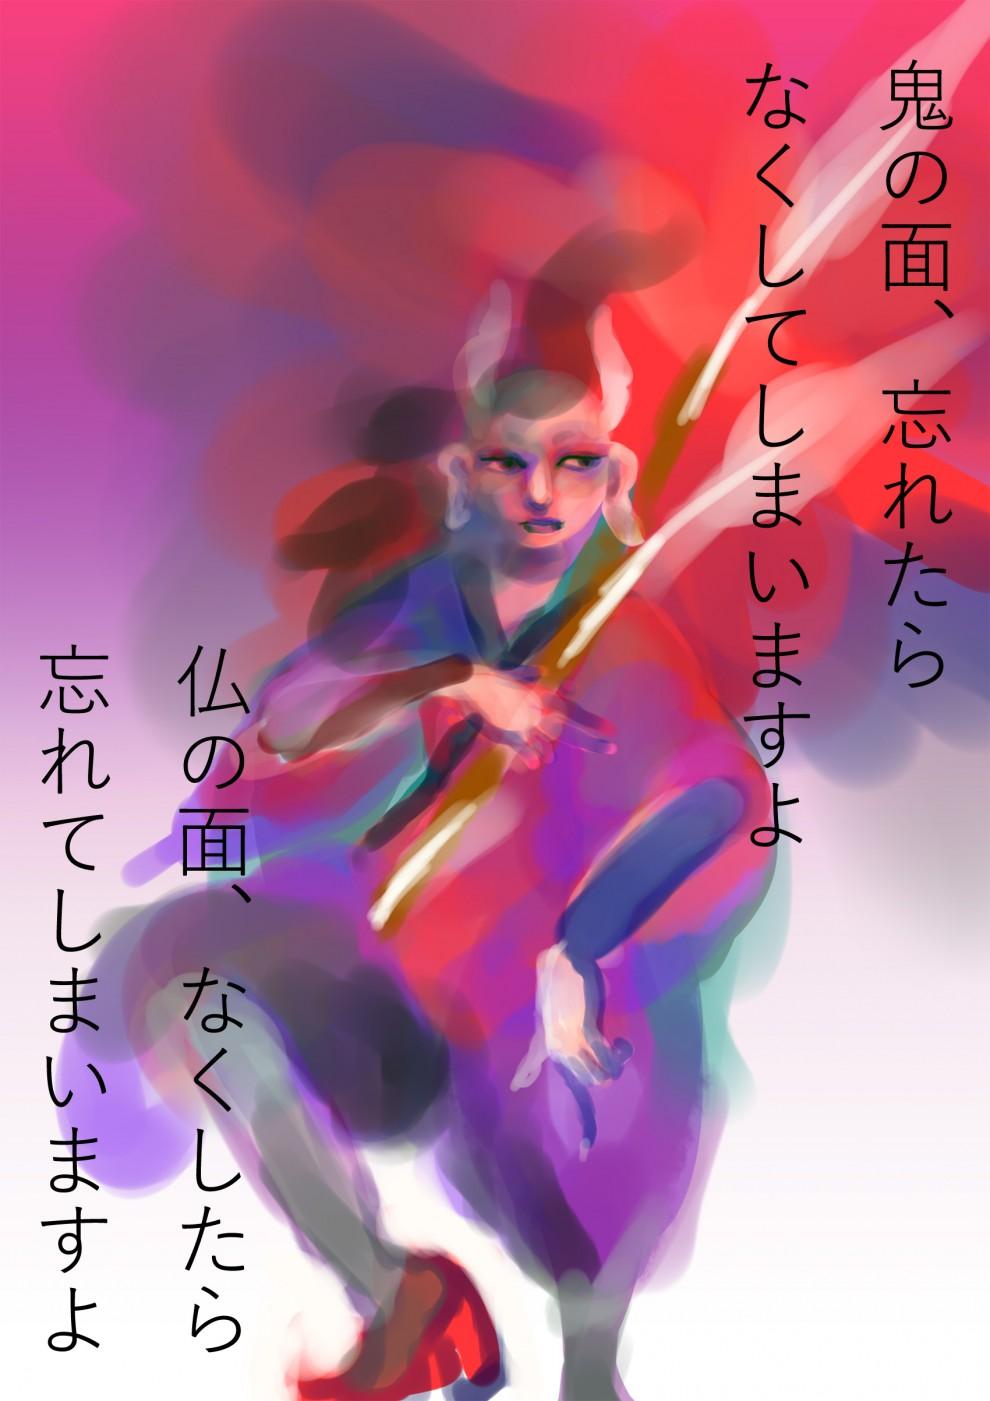 http://ahito.com/comic/ehon/voice/img//2017/20171114/07.jpg